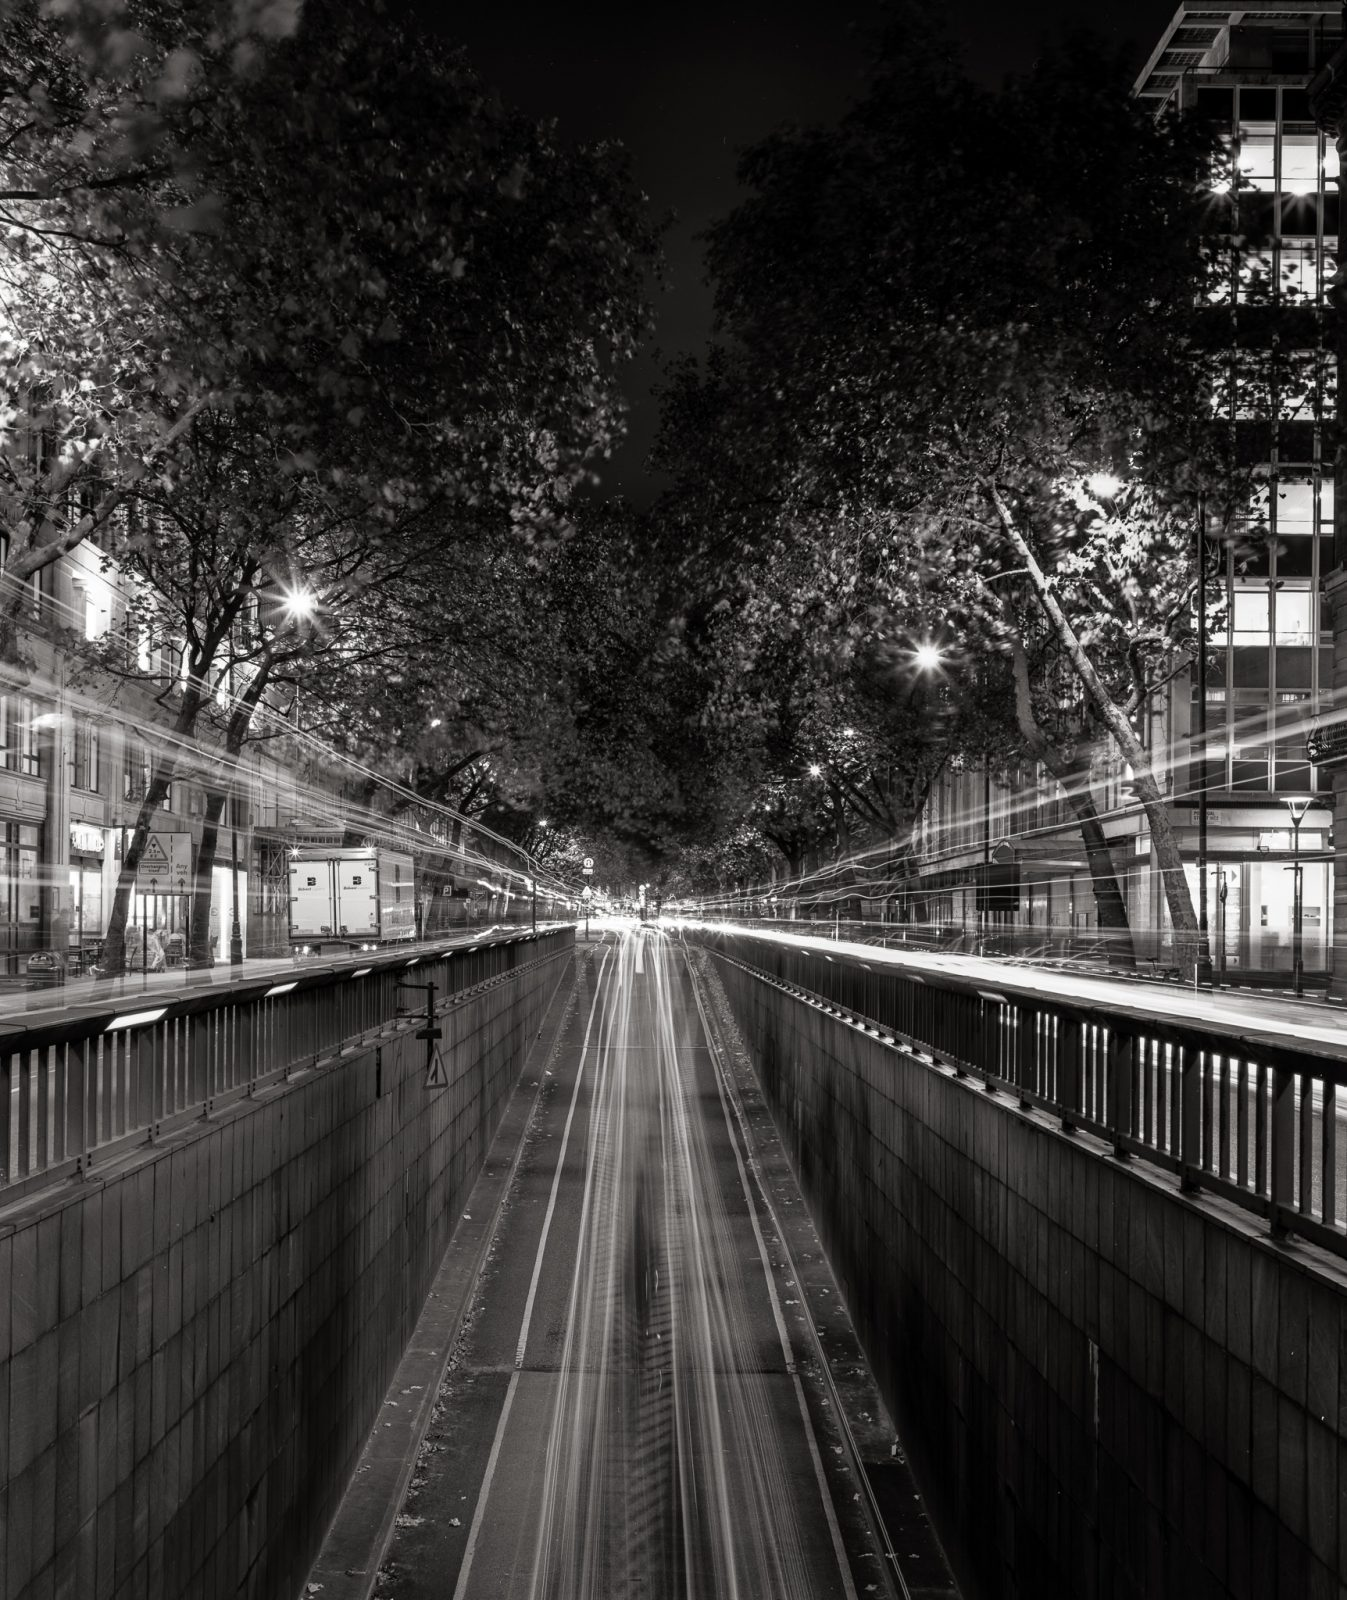 Kingsway tramway subway; Strand Underpass